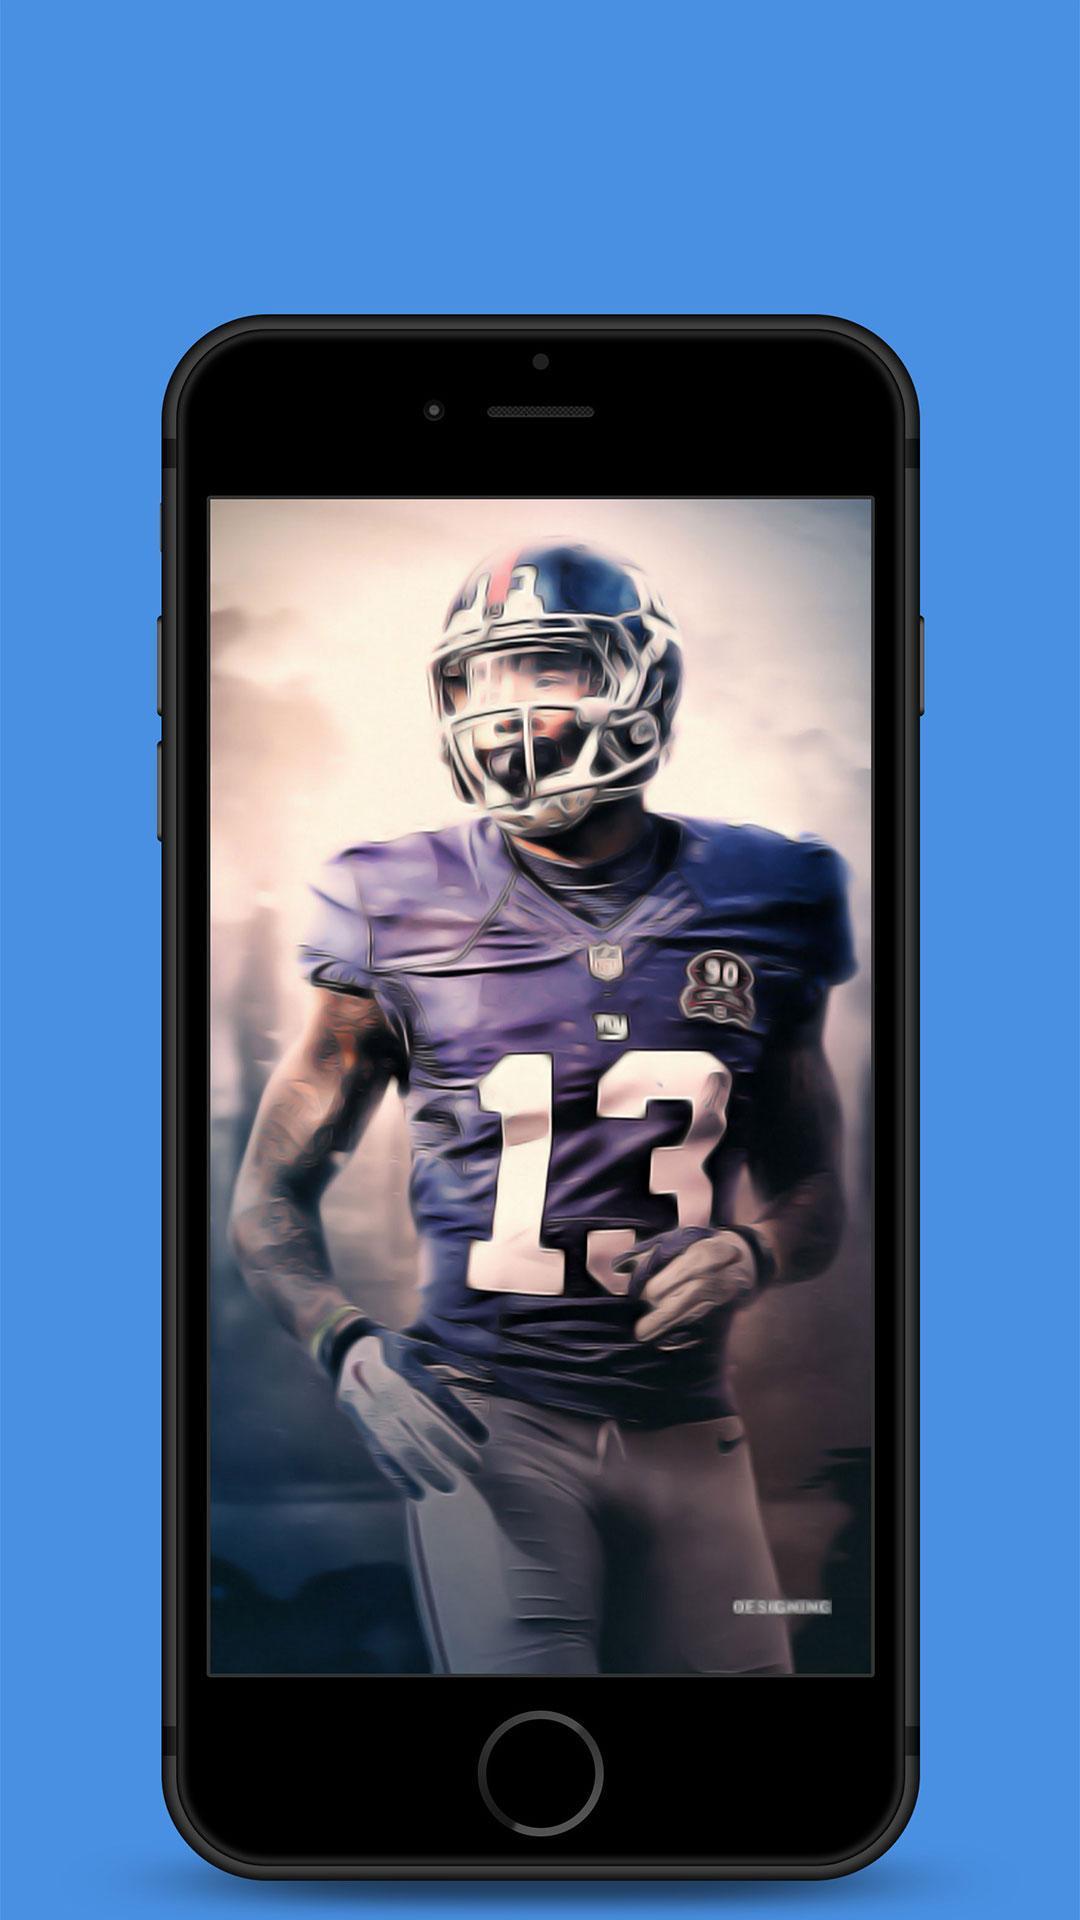 Odell Beckham Jr Wallpapers Hd 4k Nfl For Android Apk Download